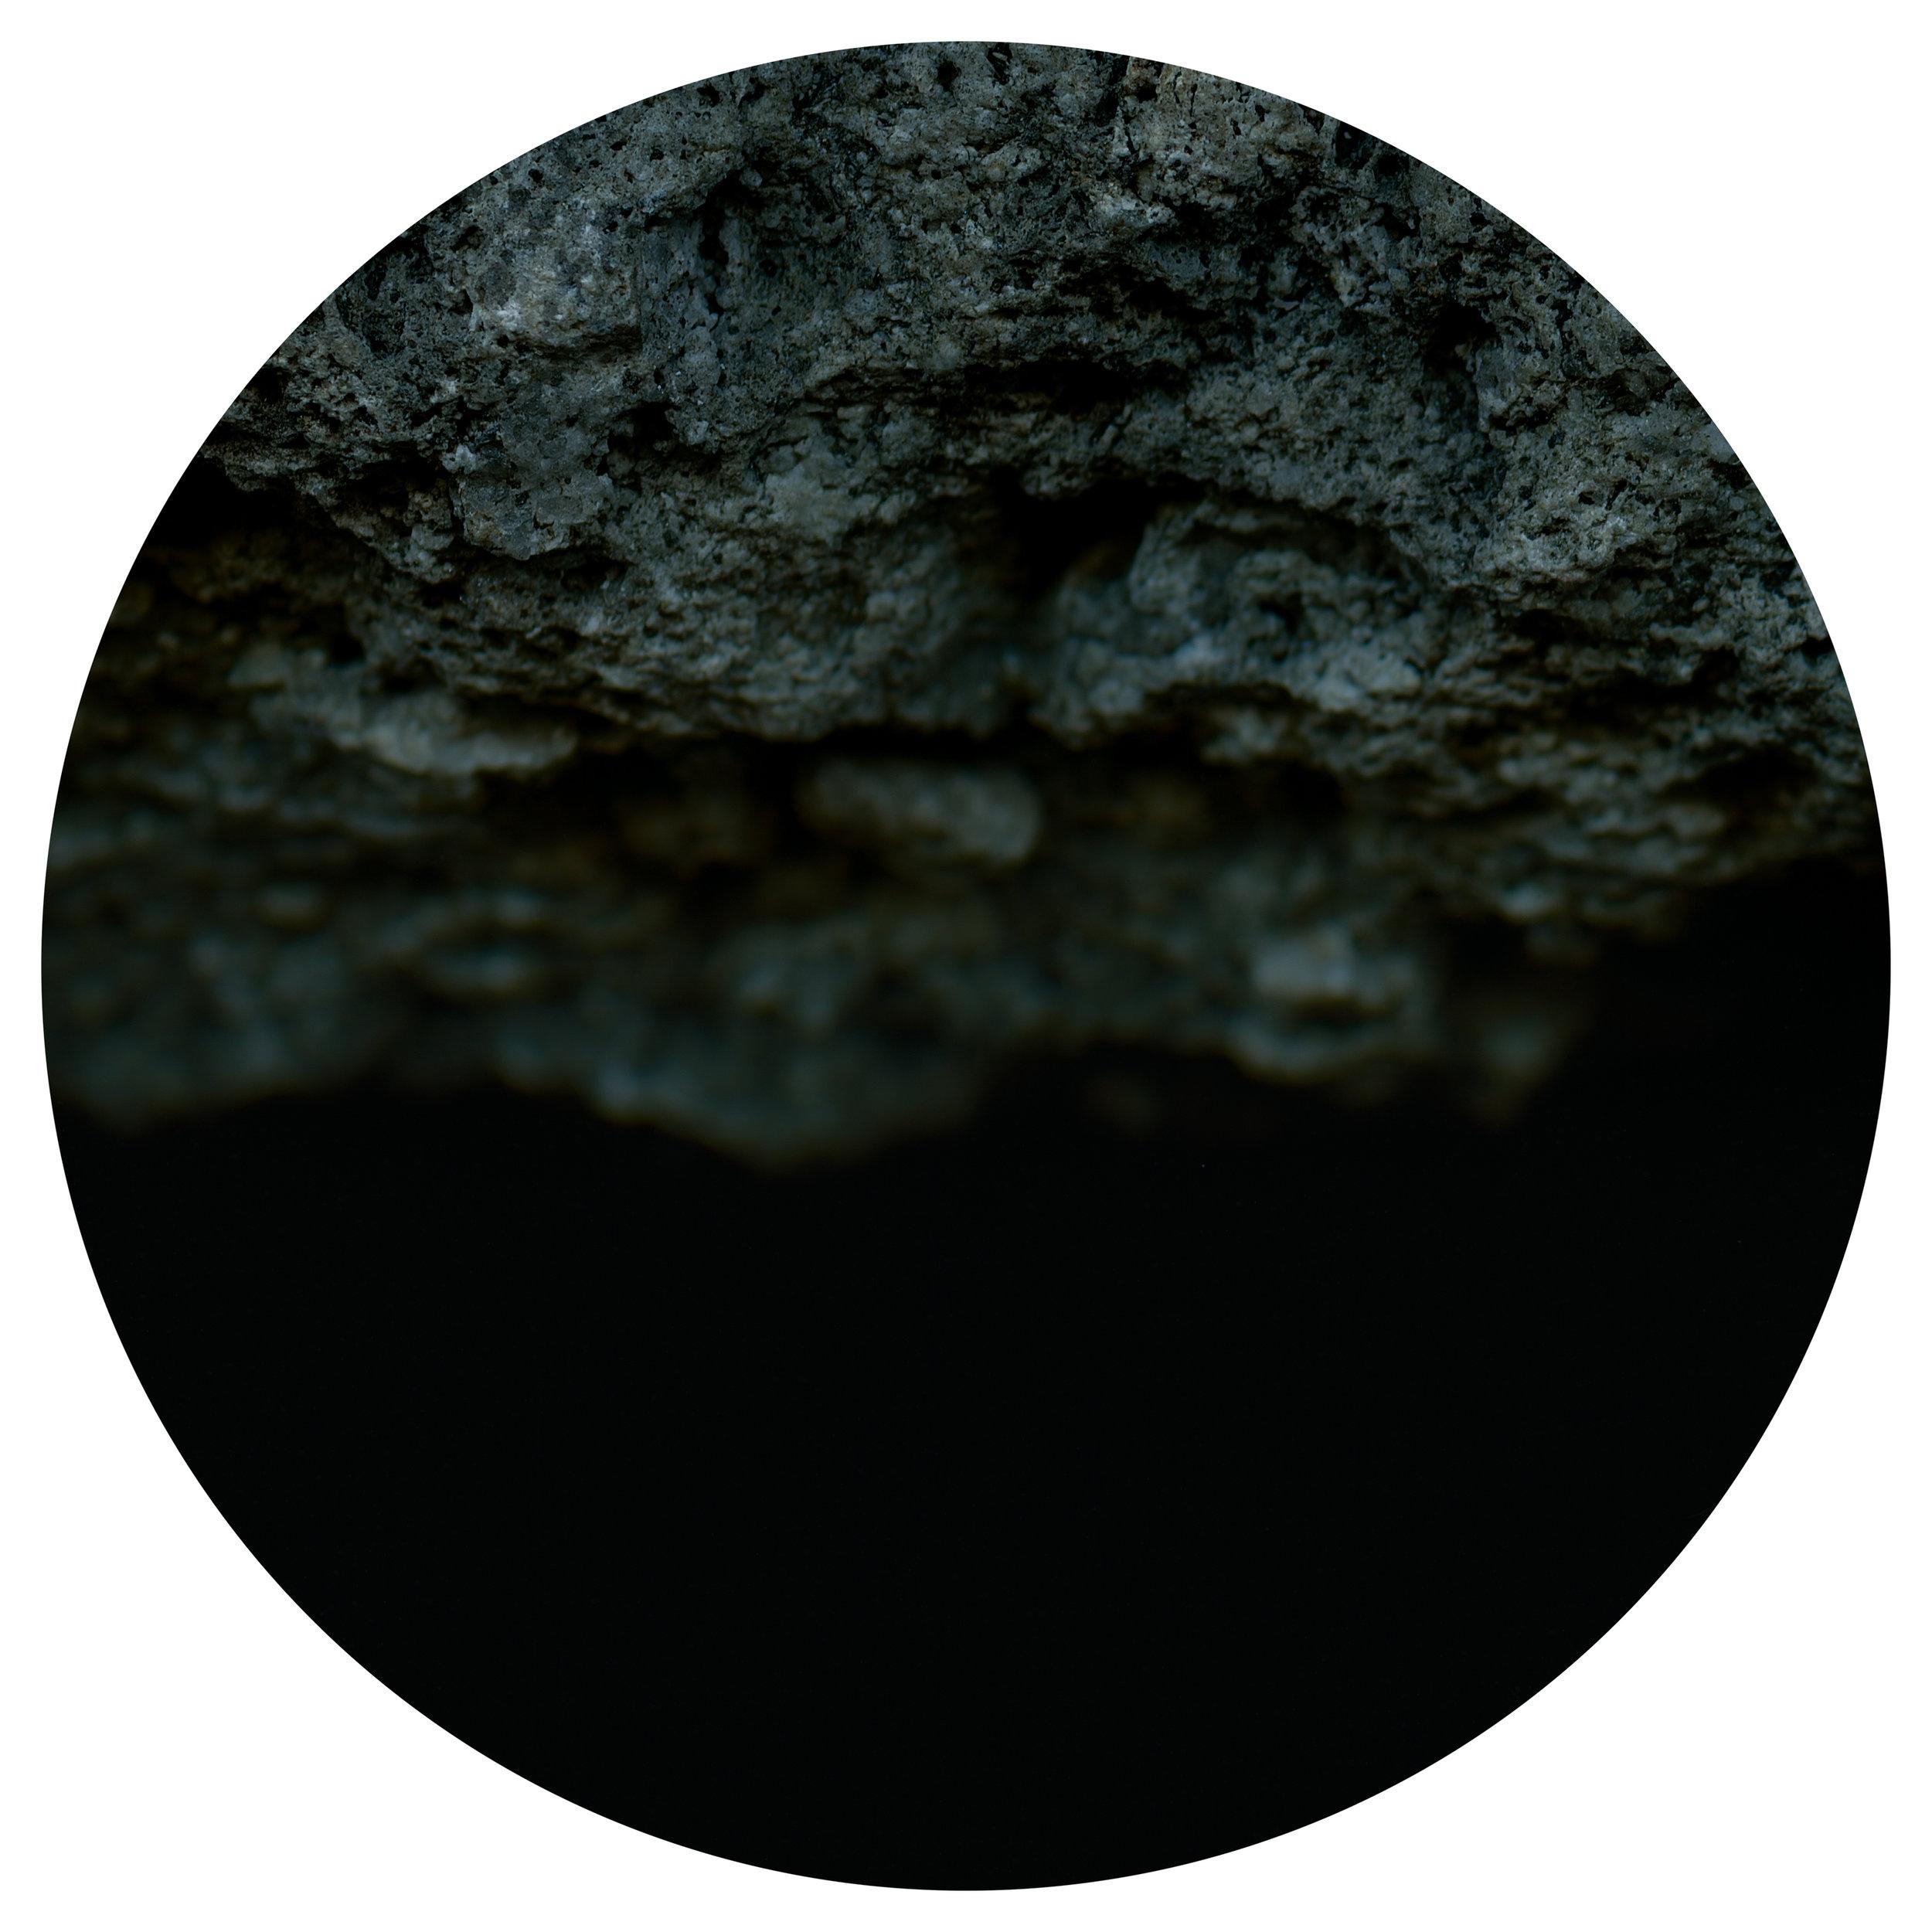 1_Planet X_1.jpg